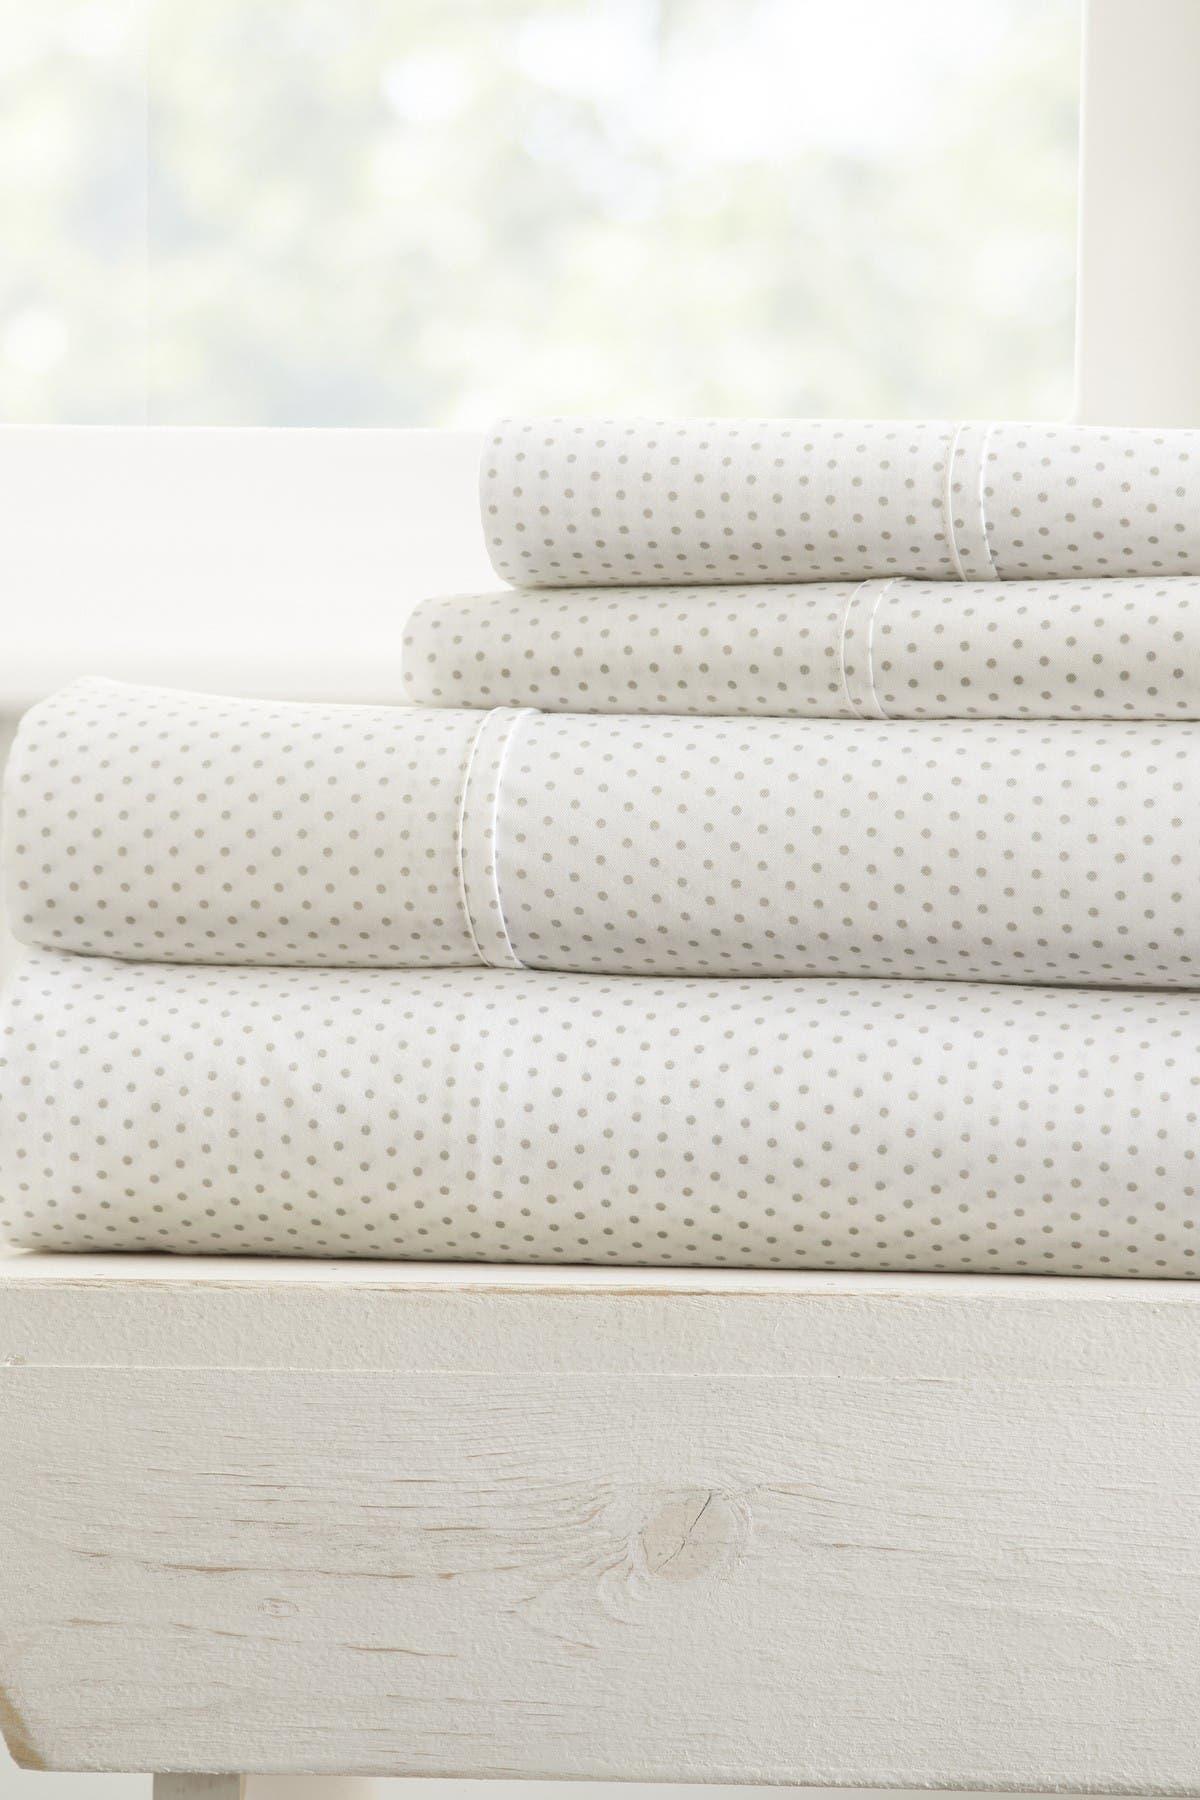 Image of IENJOY HOME The Home Spun Premium Ultra Soft 4-Piece Stippled Pattern King Bed Sheet Set - Light Gray